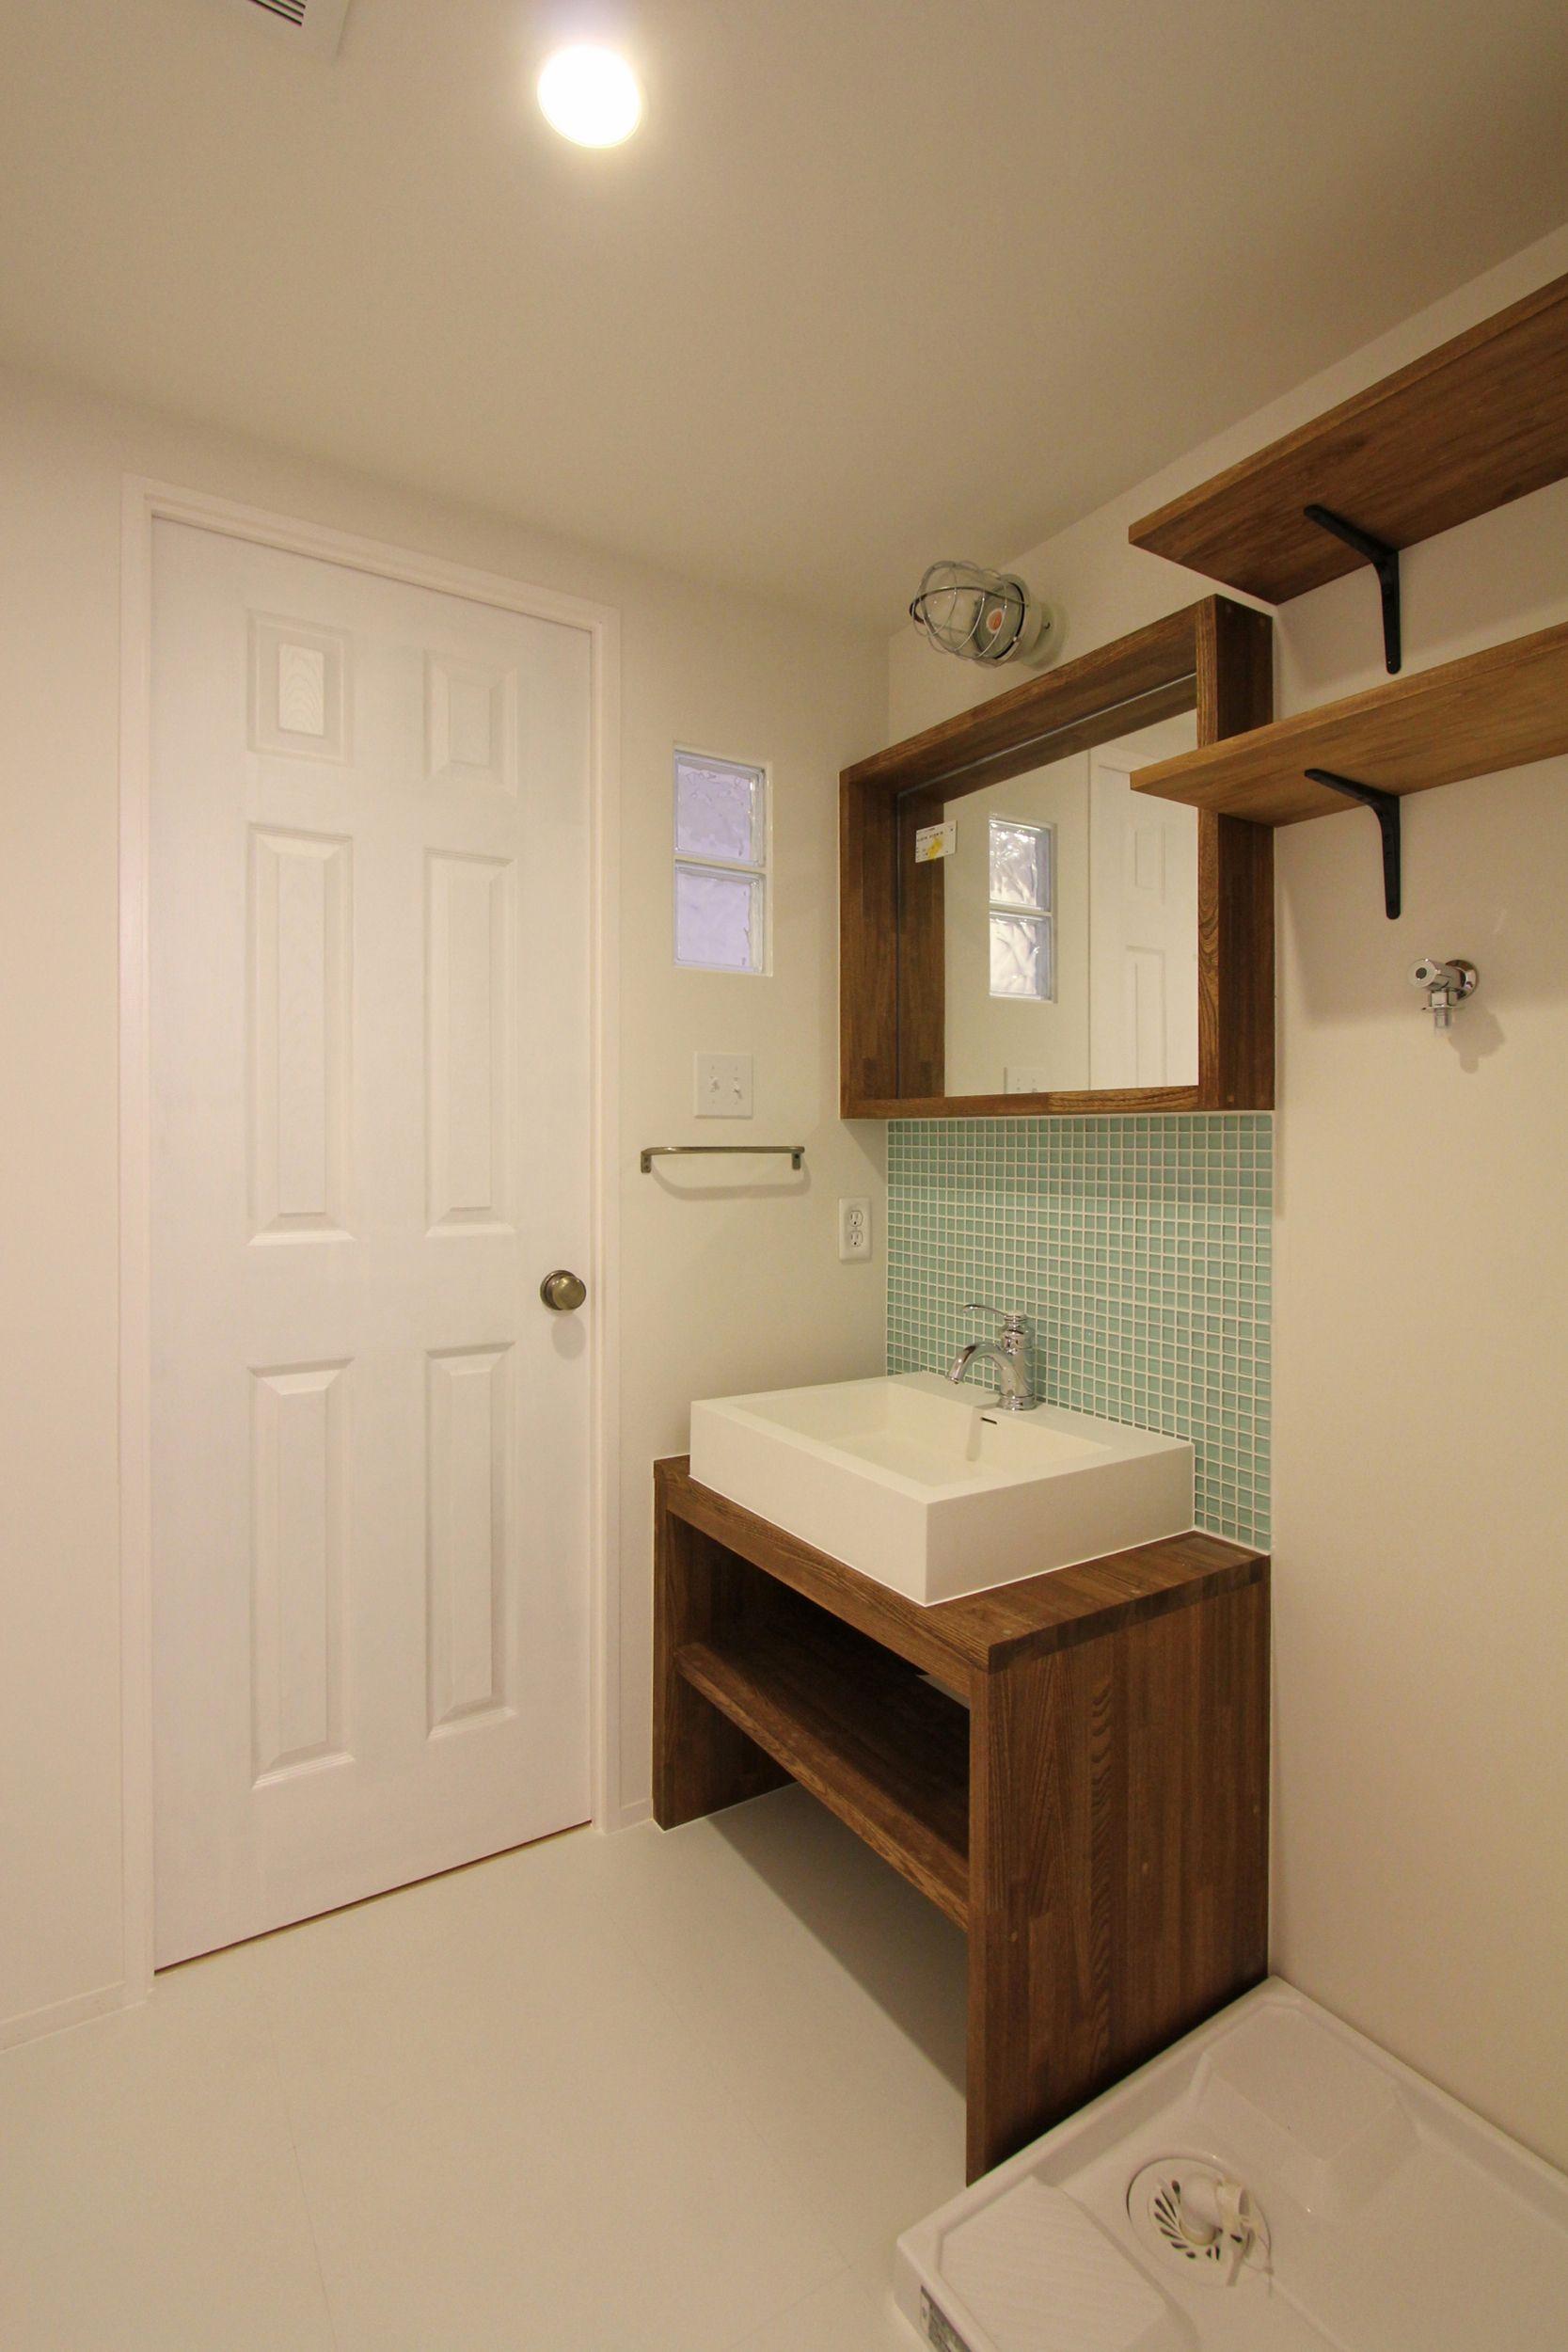 Lavatory Powder Room Toilet Tile 洗面室 トイレ 洗面台 洗面器